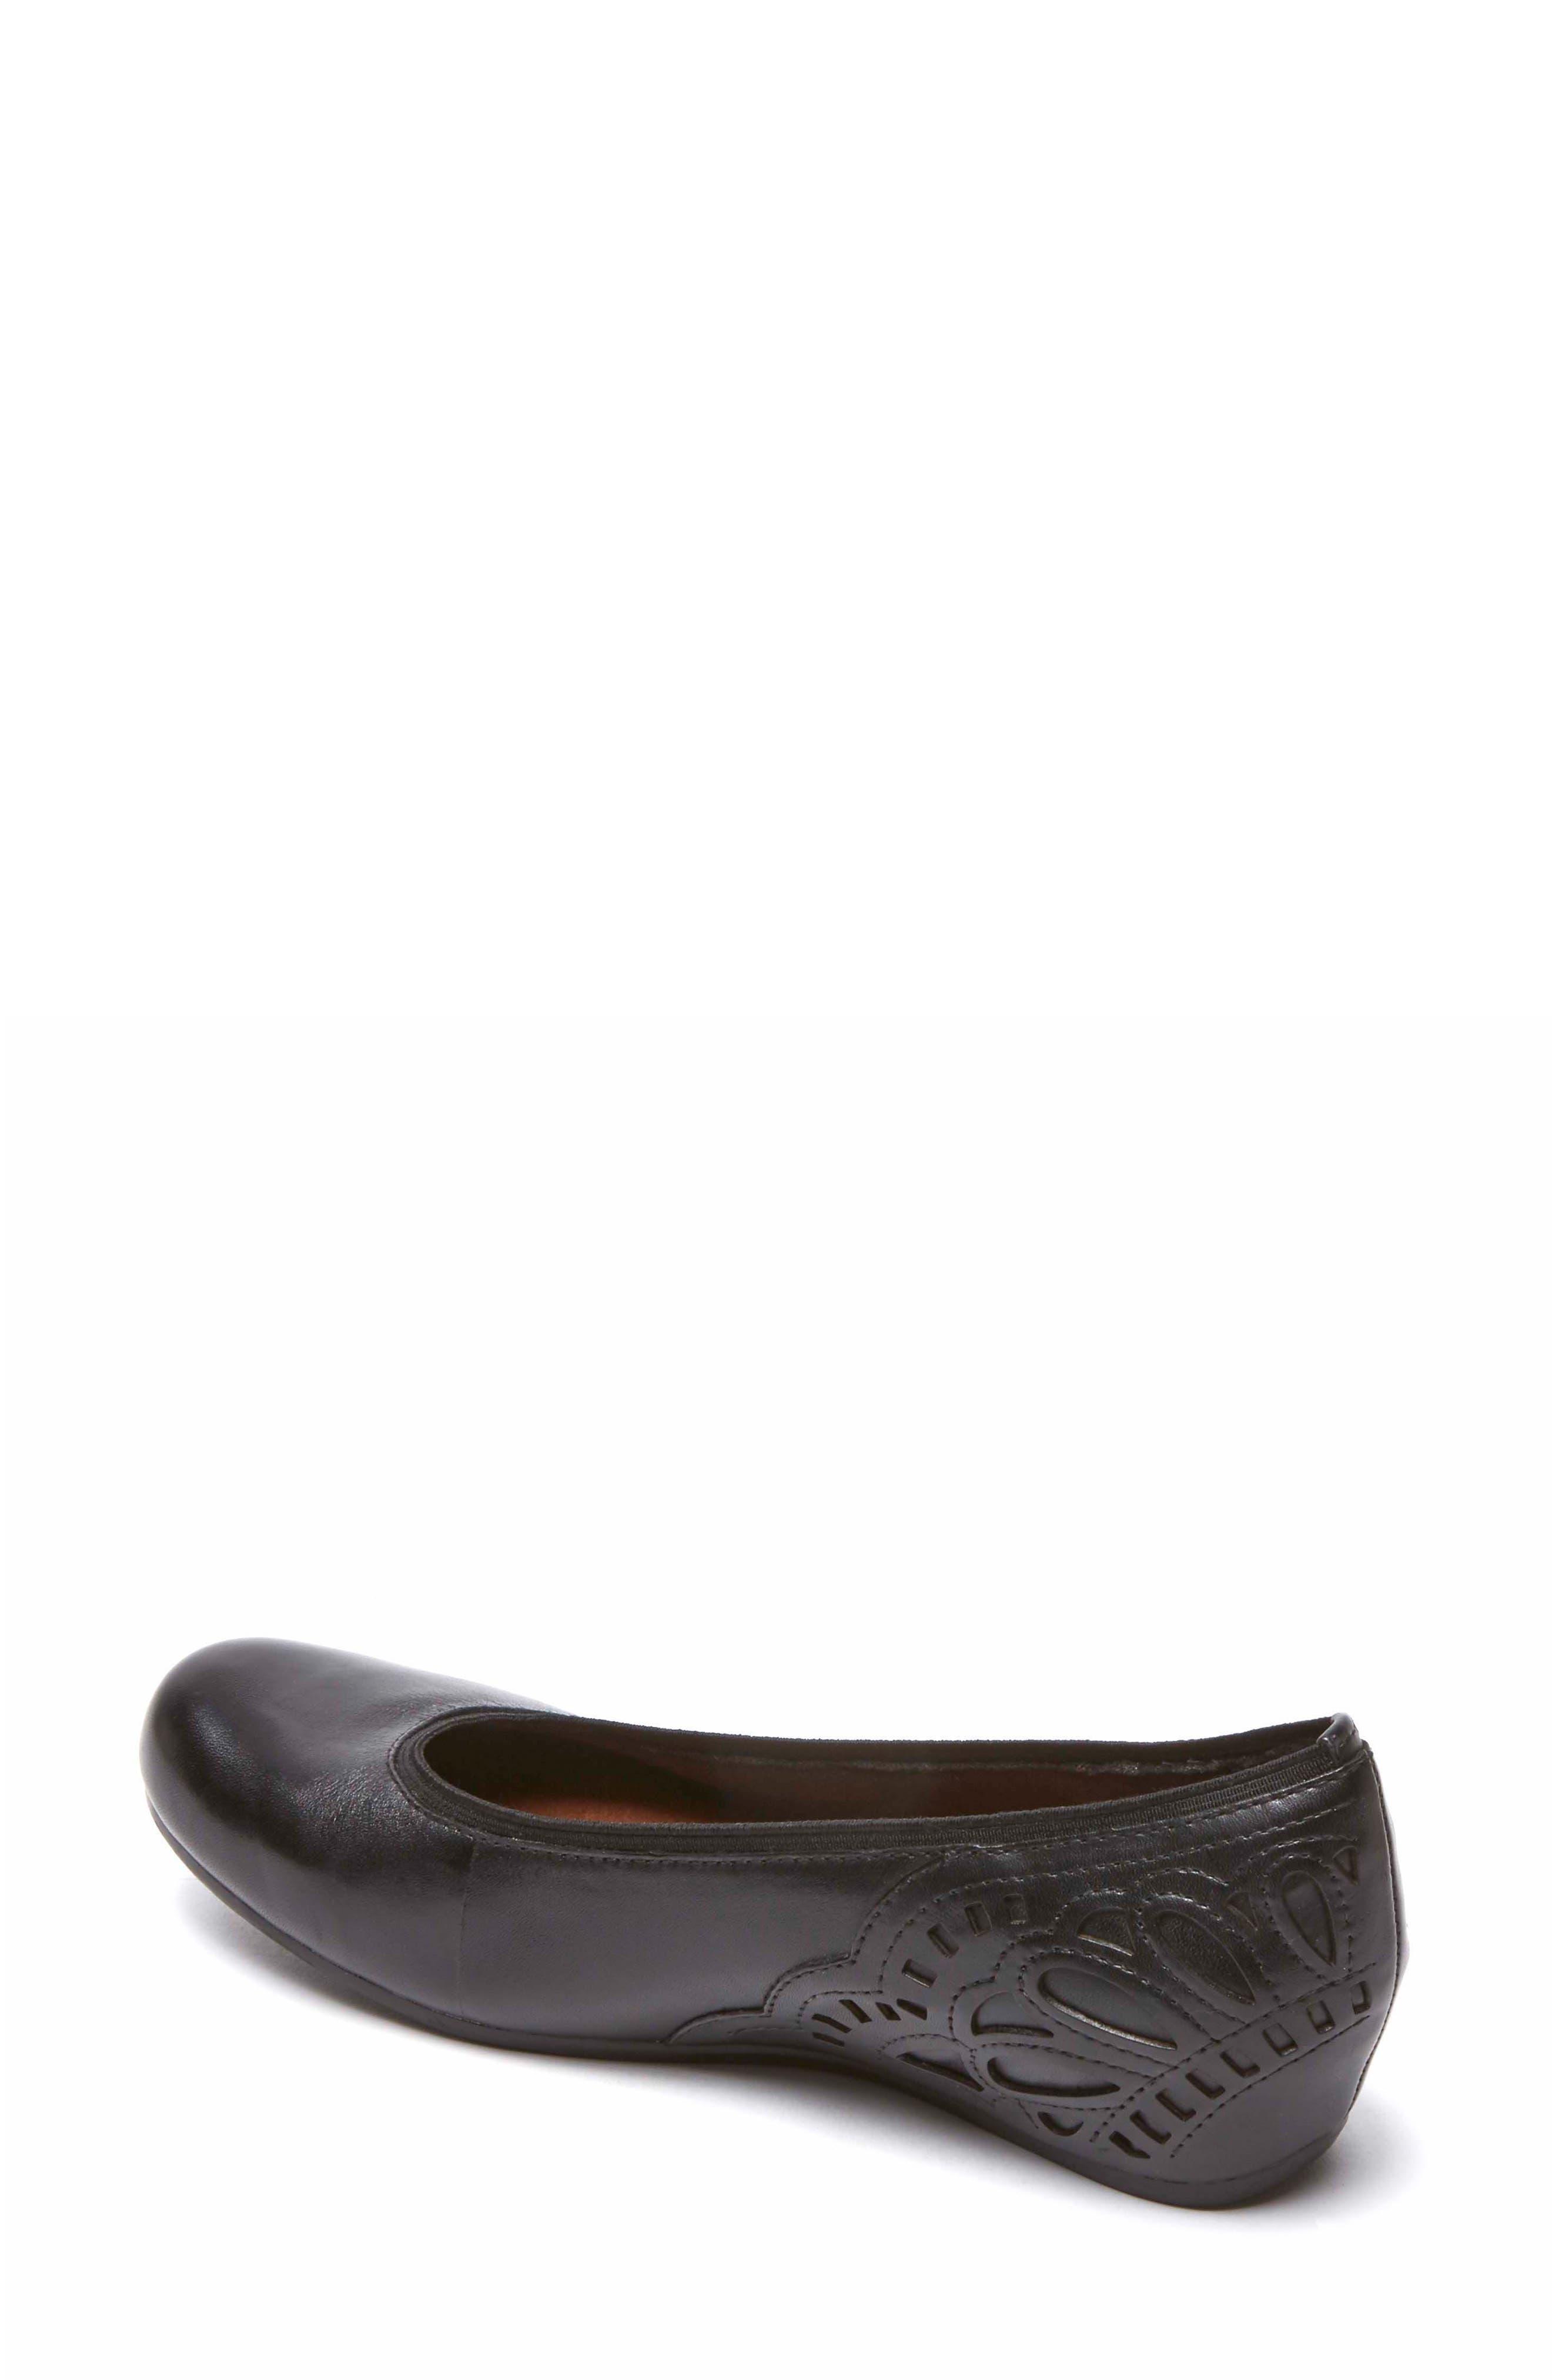 Sharleen Wedge Pump,                             Alternate thumbnail 2, color,                             Black Leather